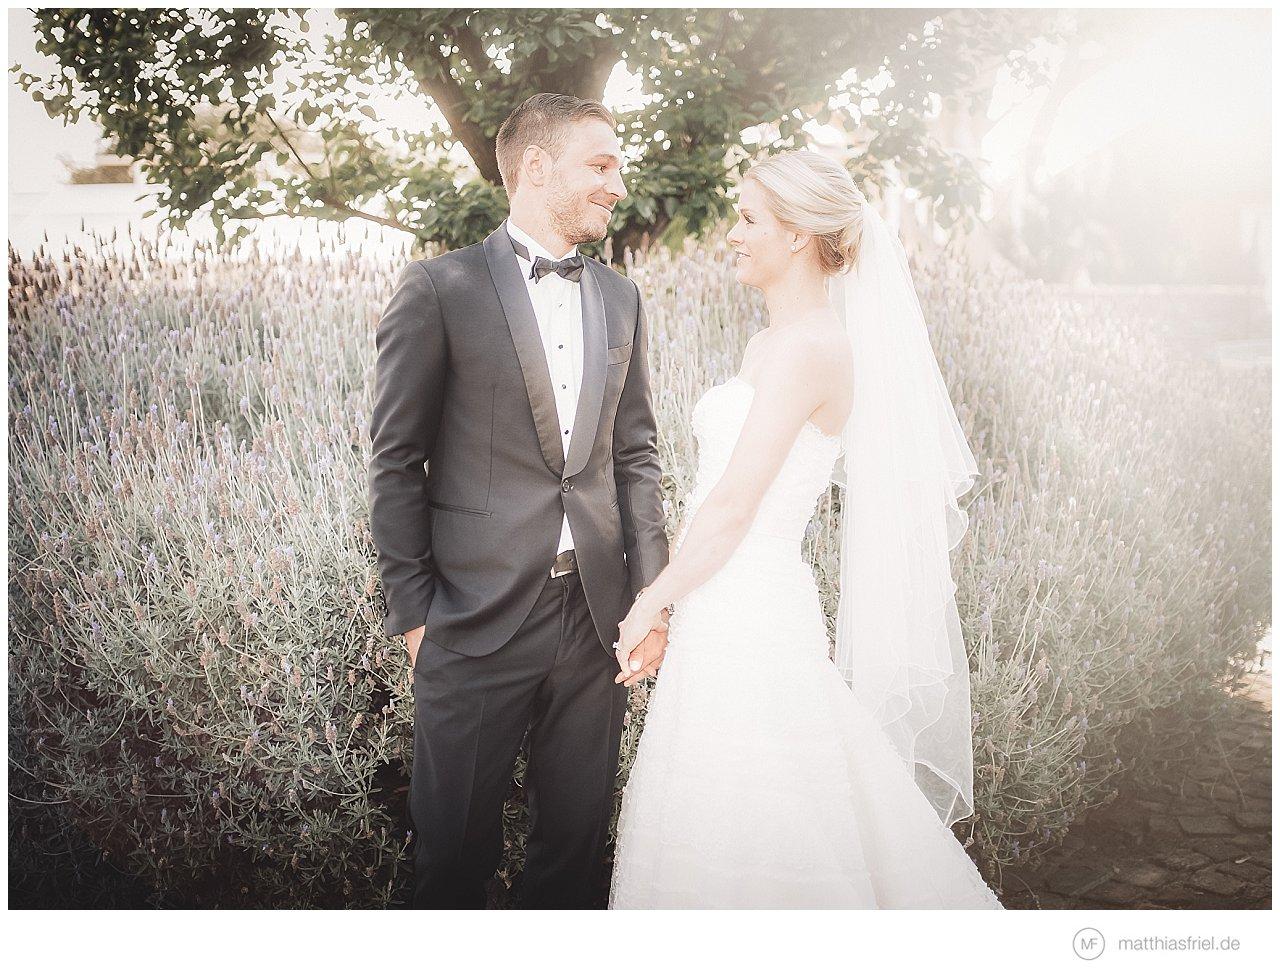 wedding-jamie-tom-australia-port-elliot-international-wedding-photographer-matthias-friel